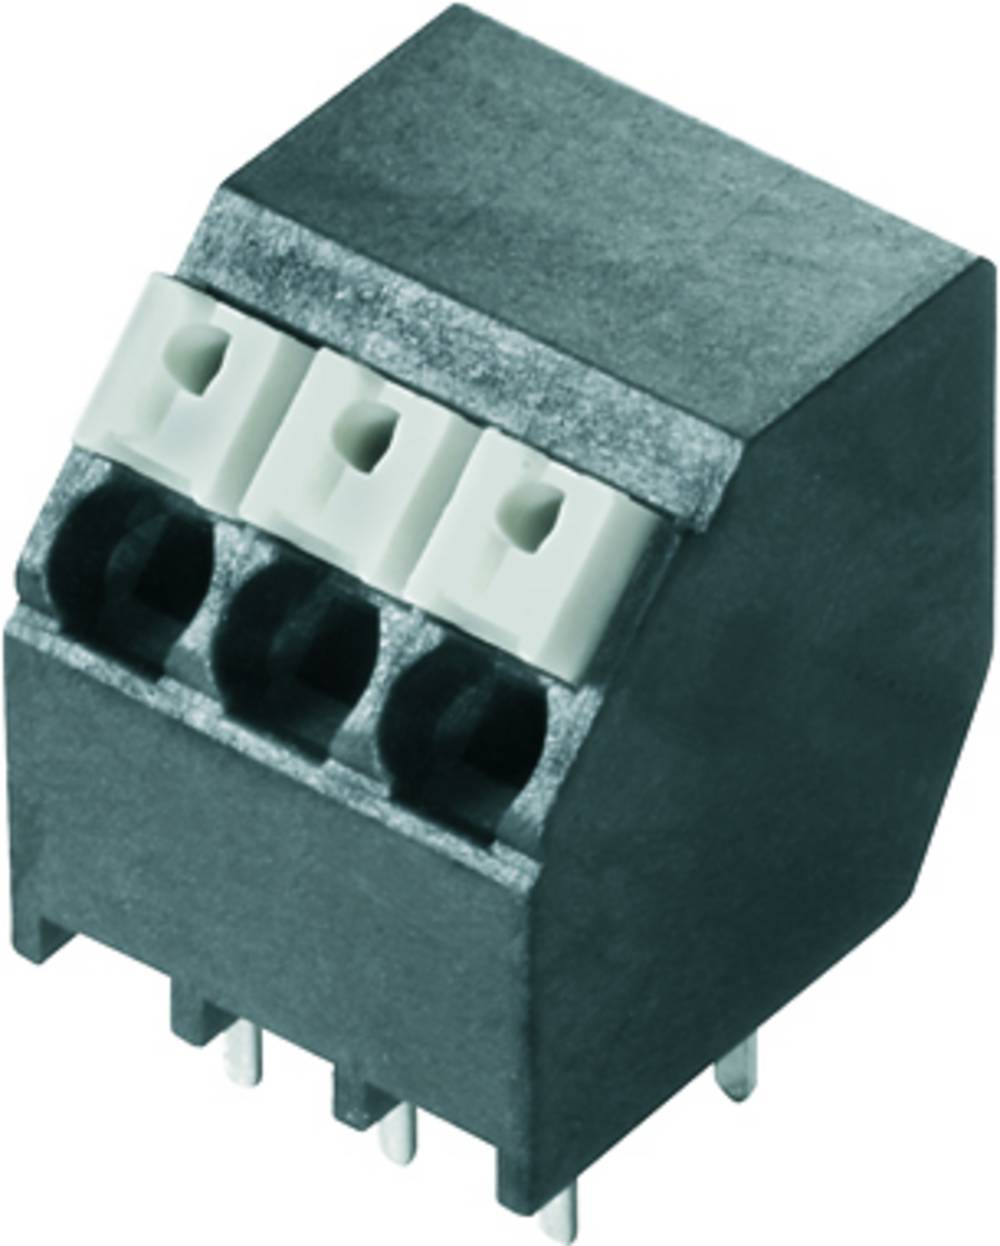 Fjederkraftsklemmeblok Weidmüller LSF-SMT 3.81/18/135 3.5SN BK TU 1.50 mm² Poltal 18 Sort 8 stk